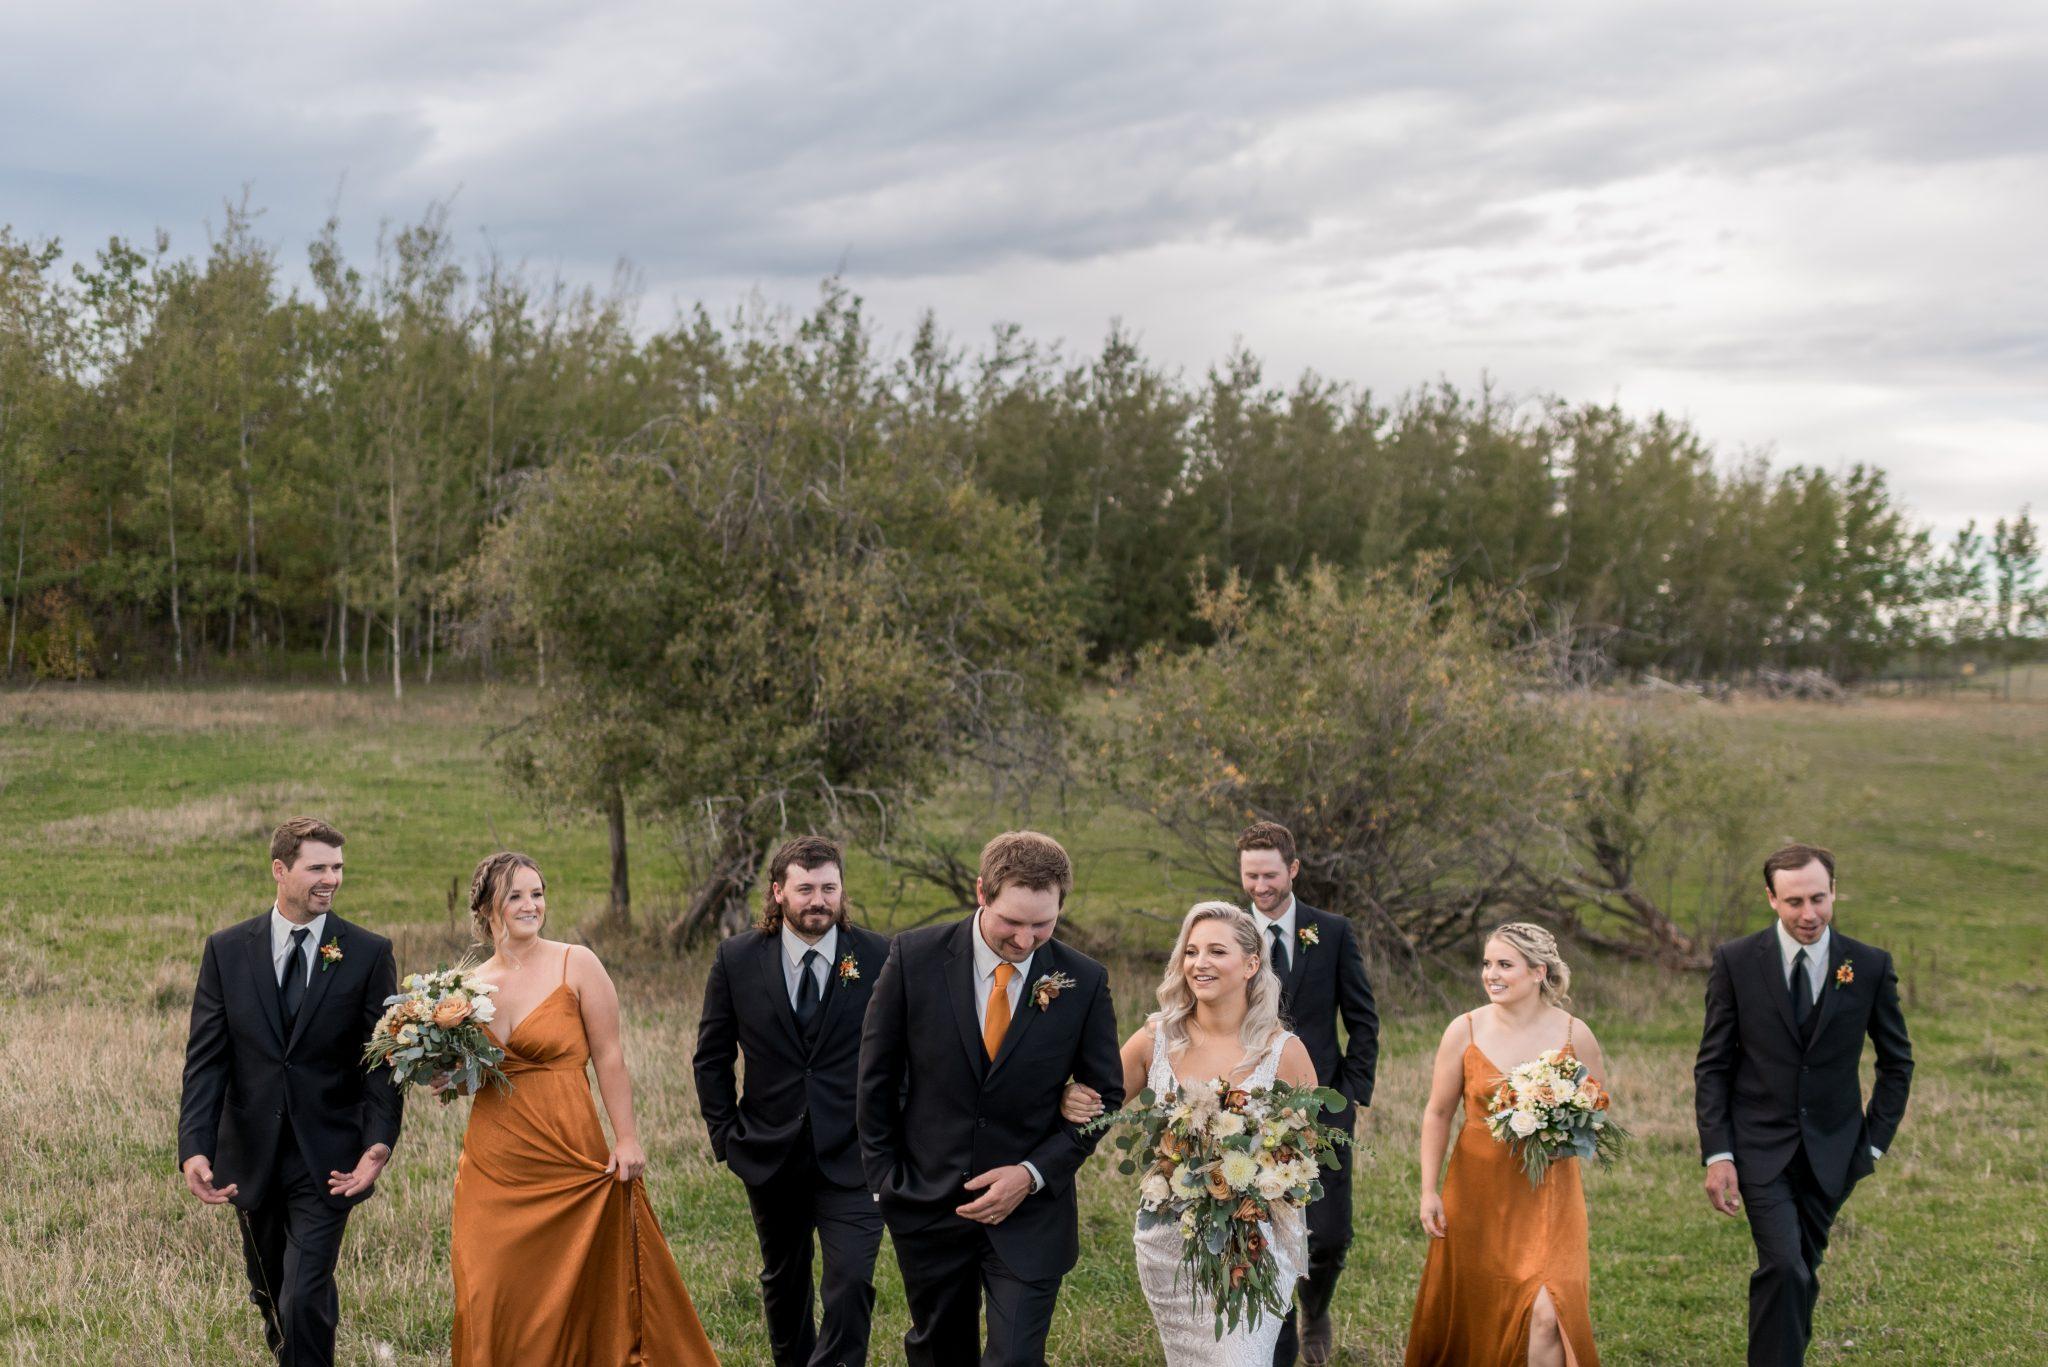 Wedding party wardrobe inspiration for a fall wedding